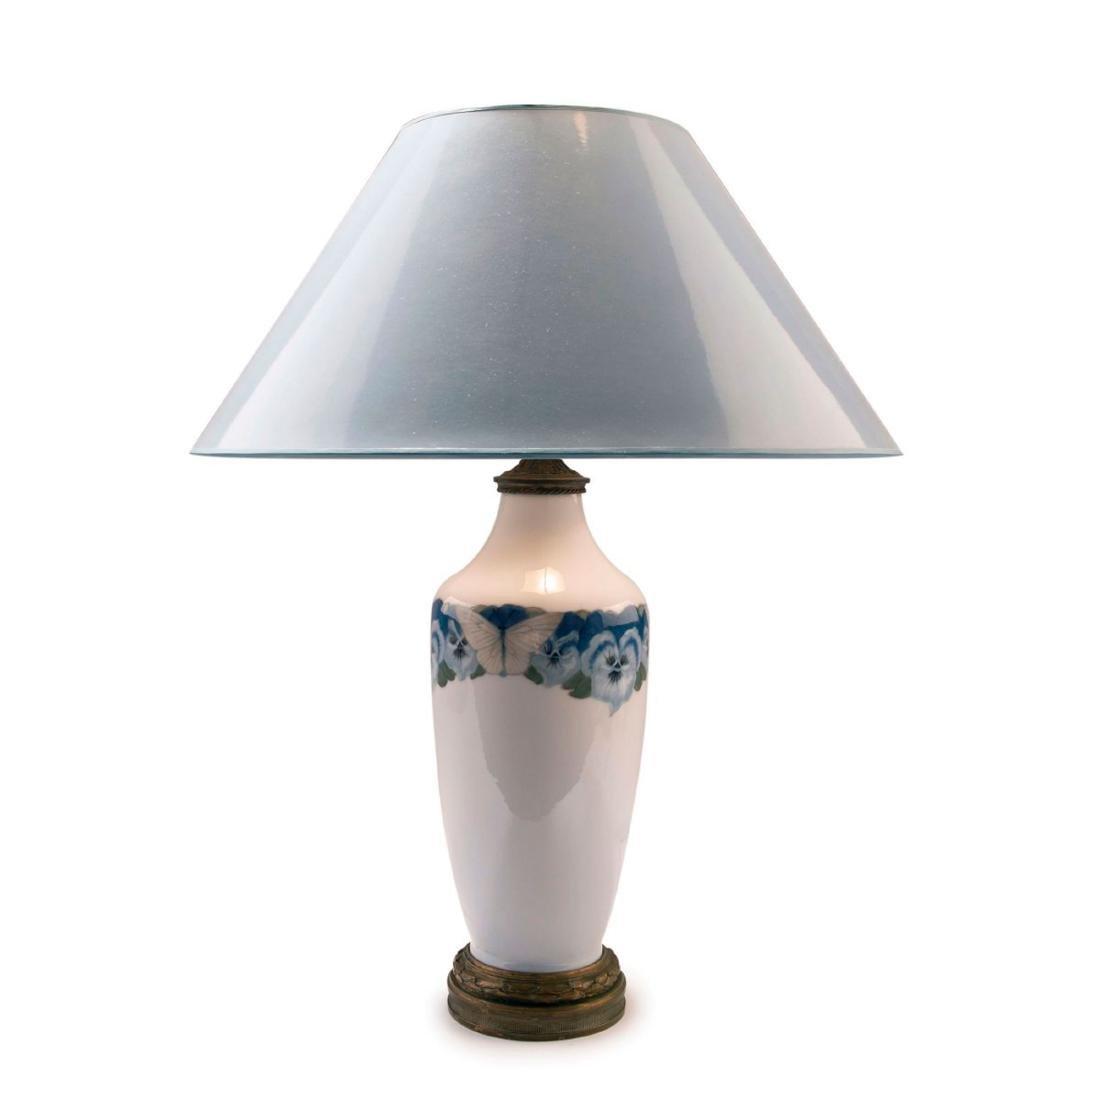 Table light, c. 1920